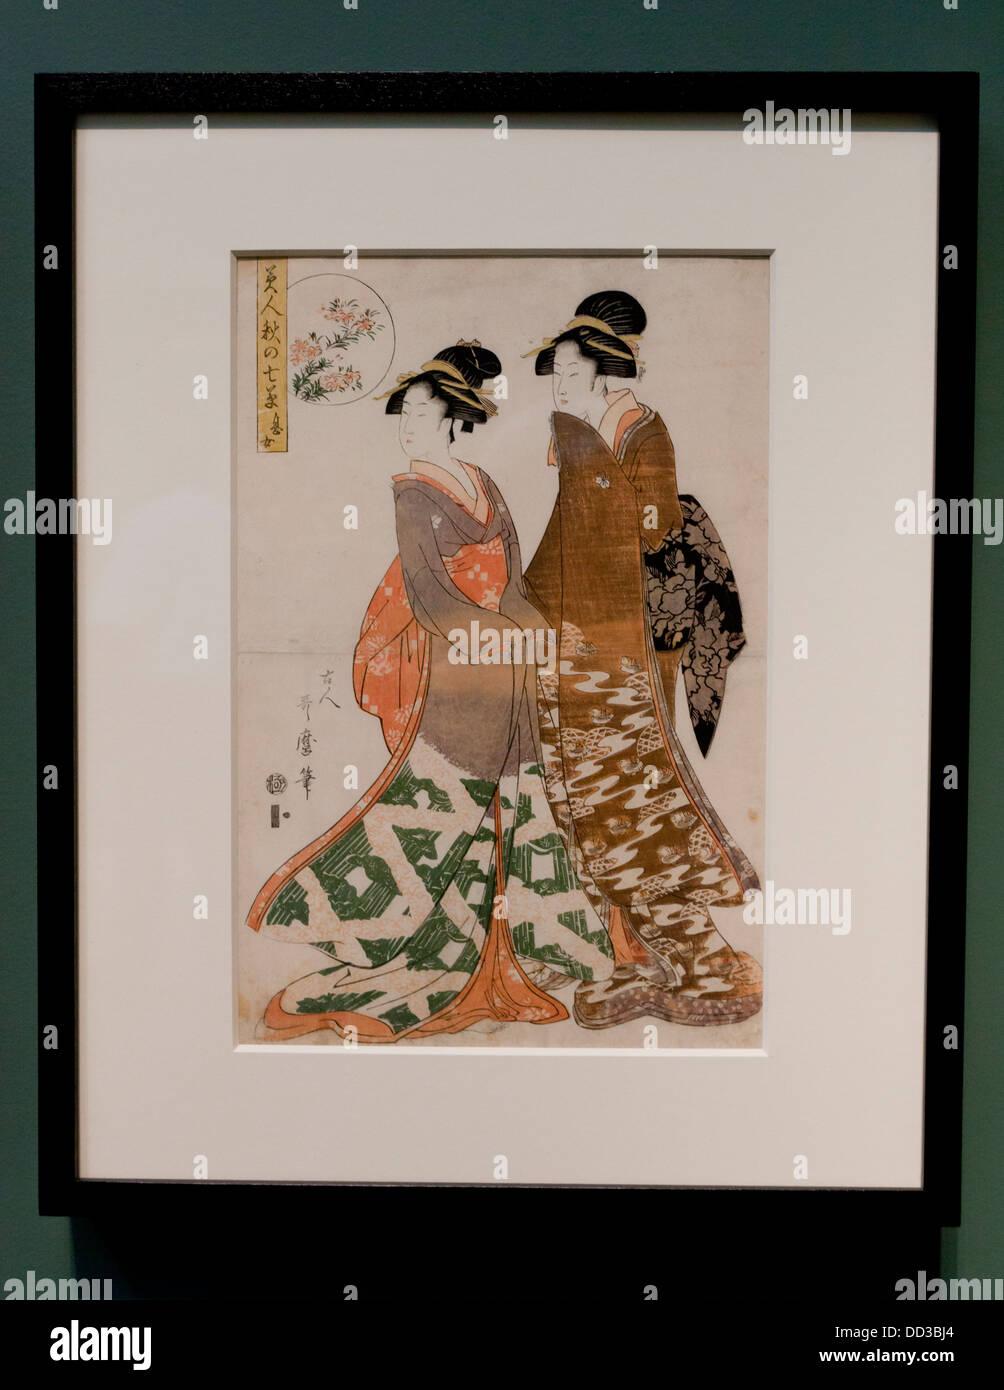 'Beauties of the Seven Autumn Grasses' Japanese woodblock print - Edo period, 19th century - Stock Image